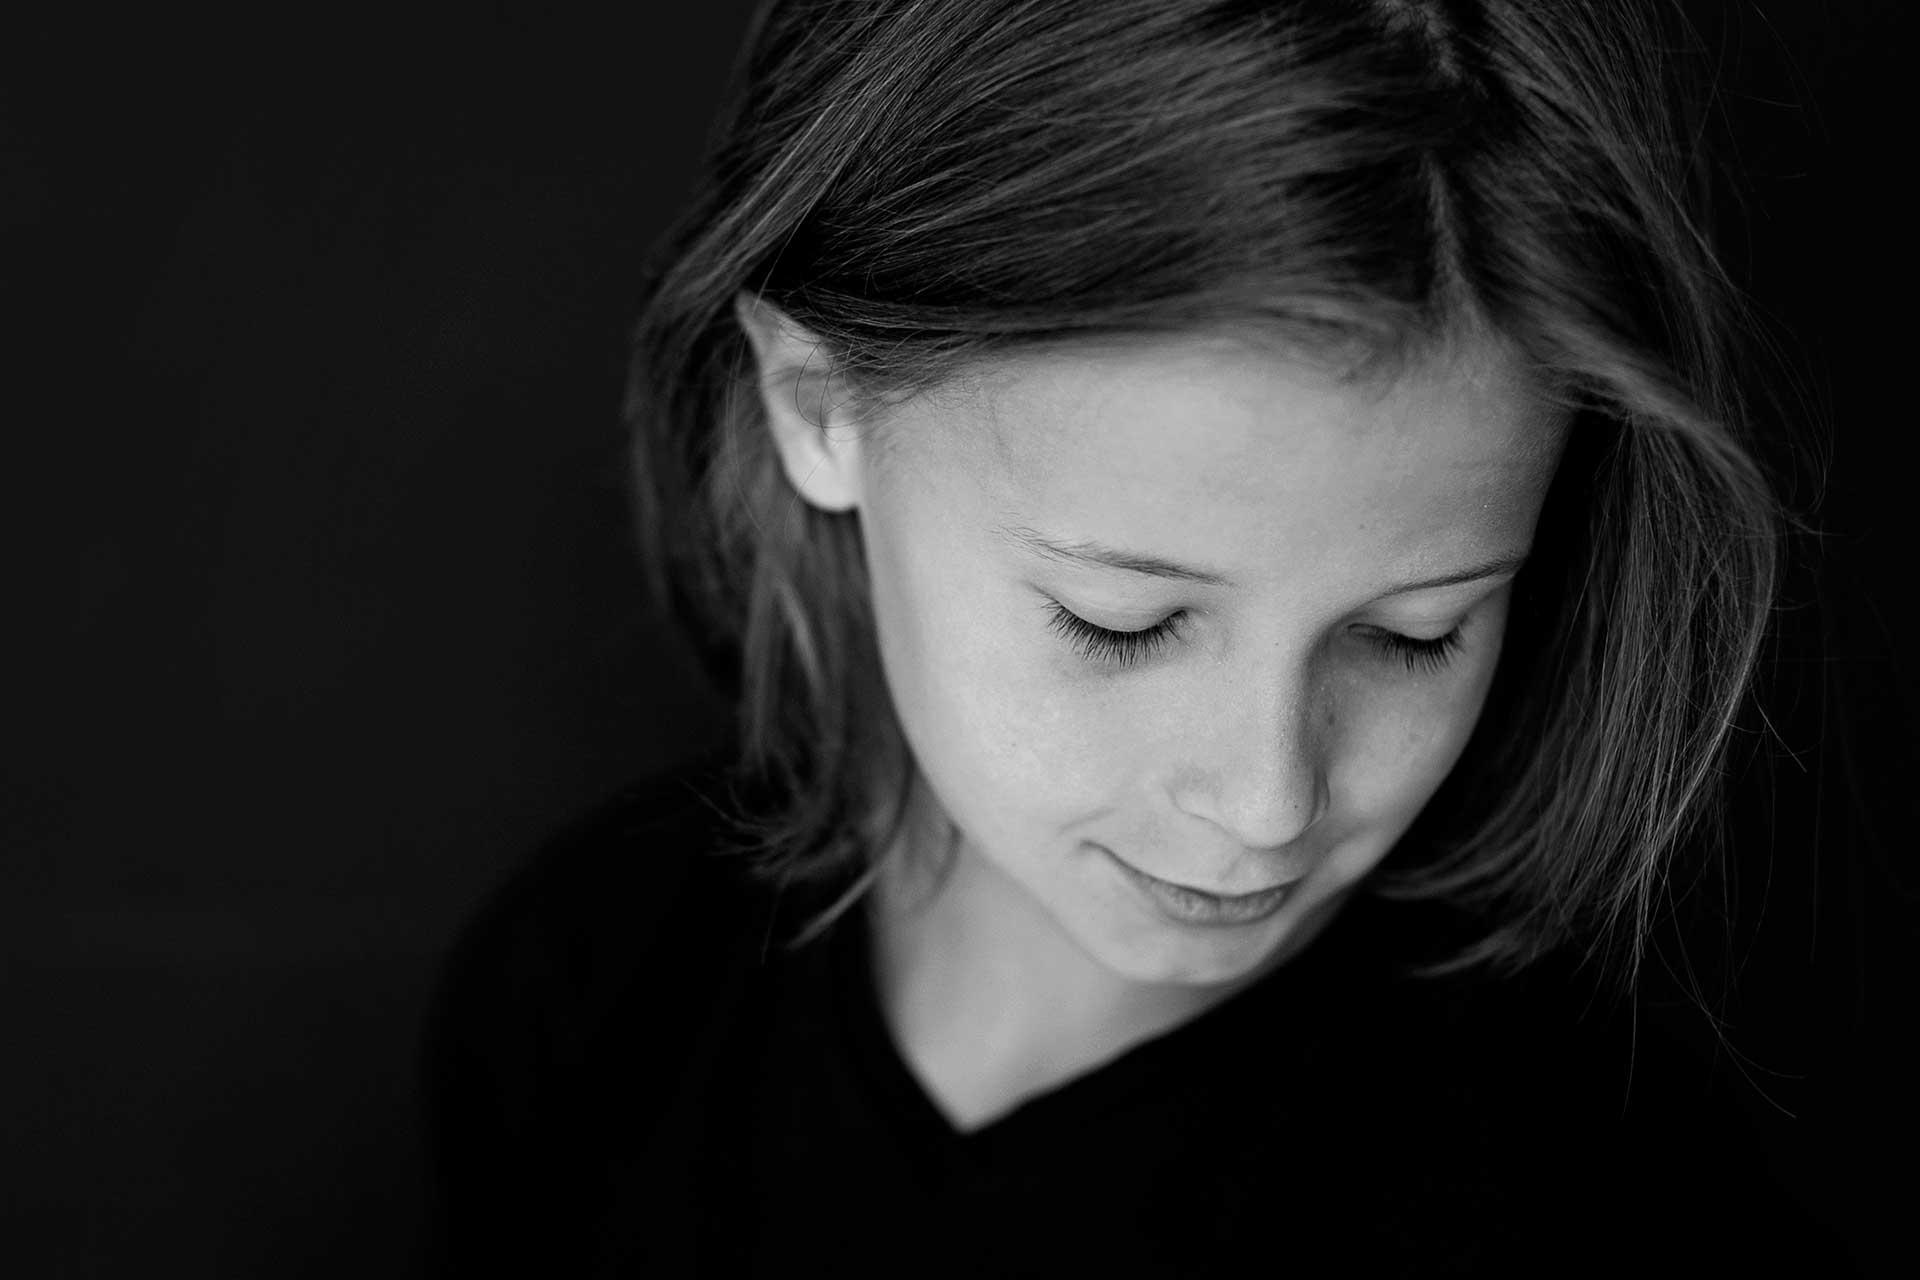 Barbara-fotografie-kind-portret